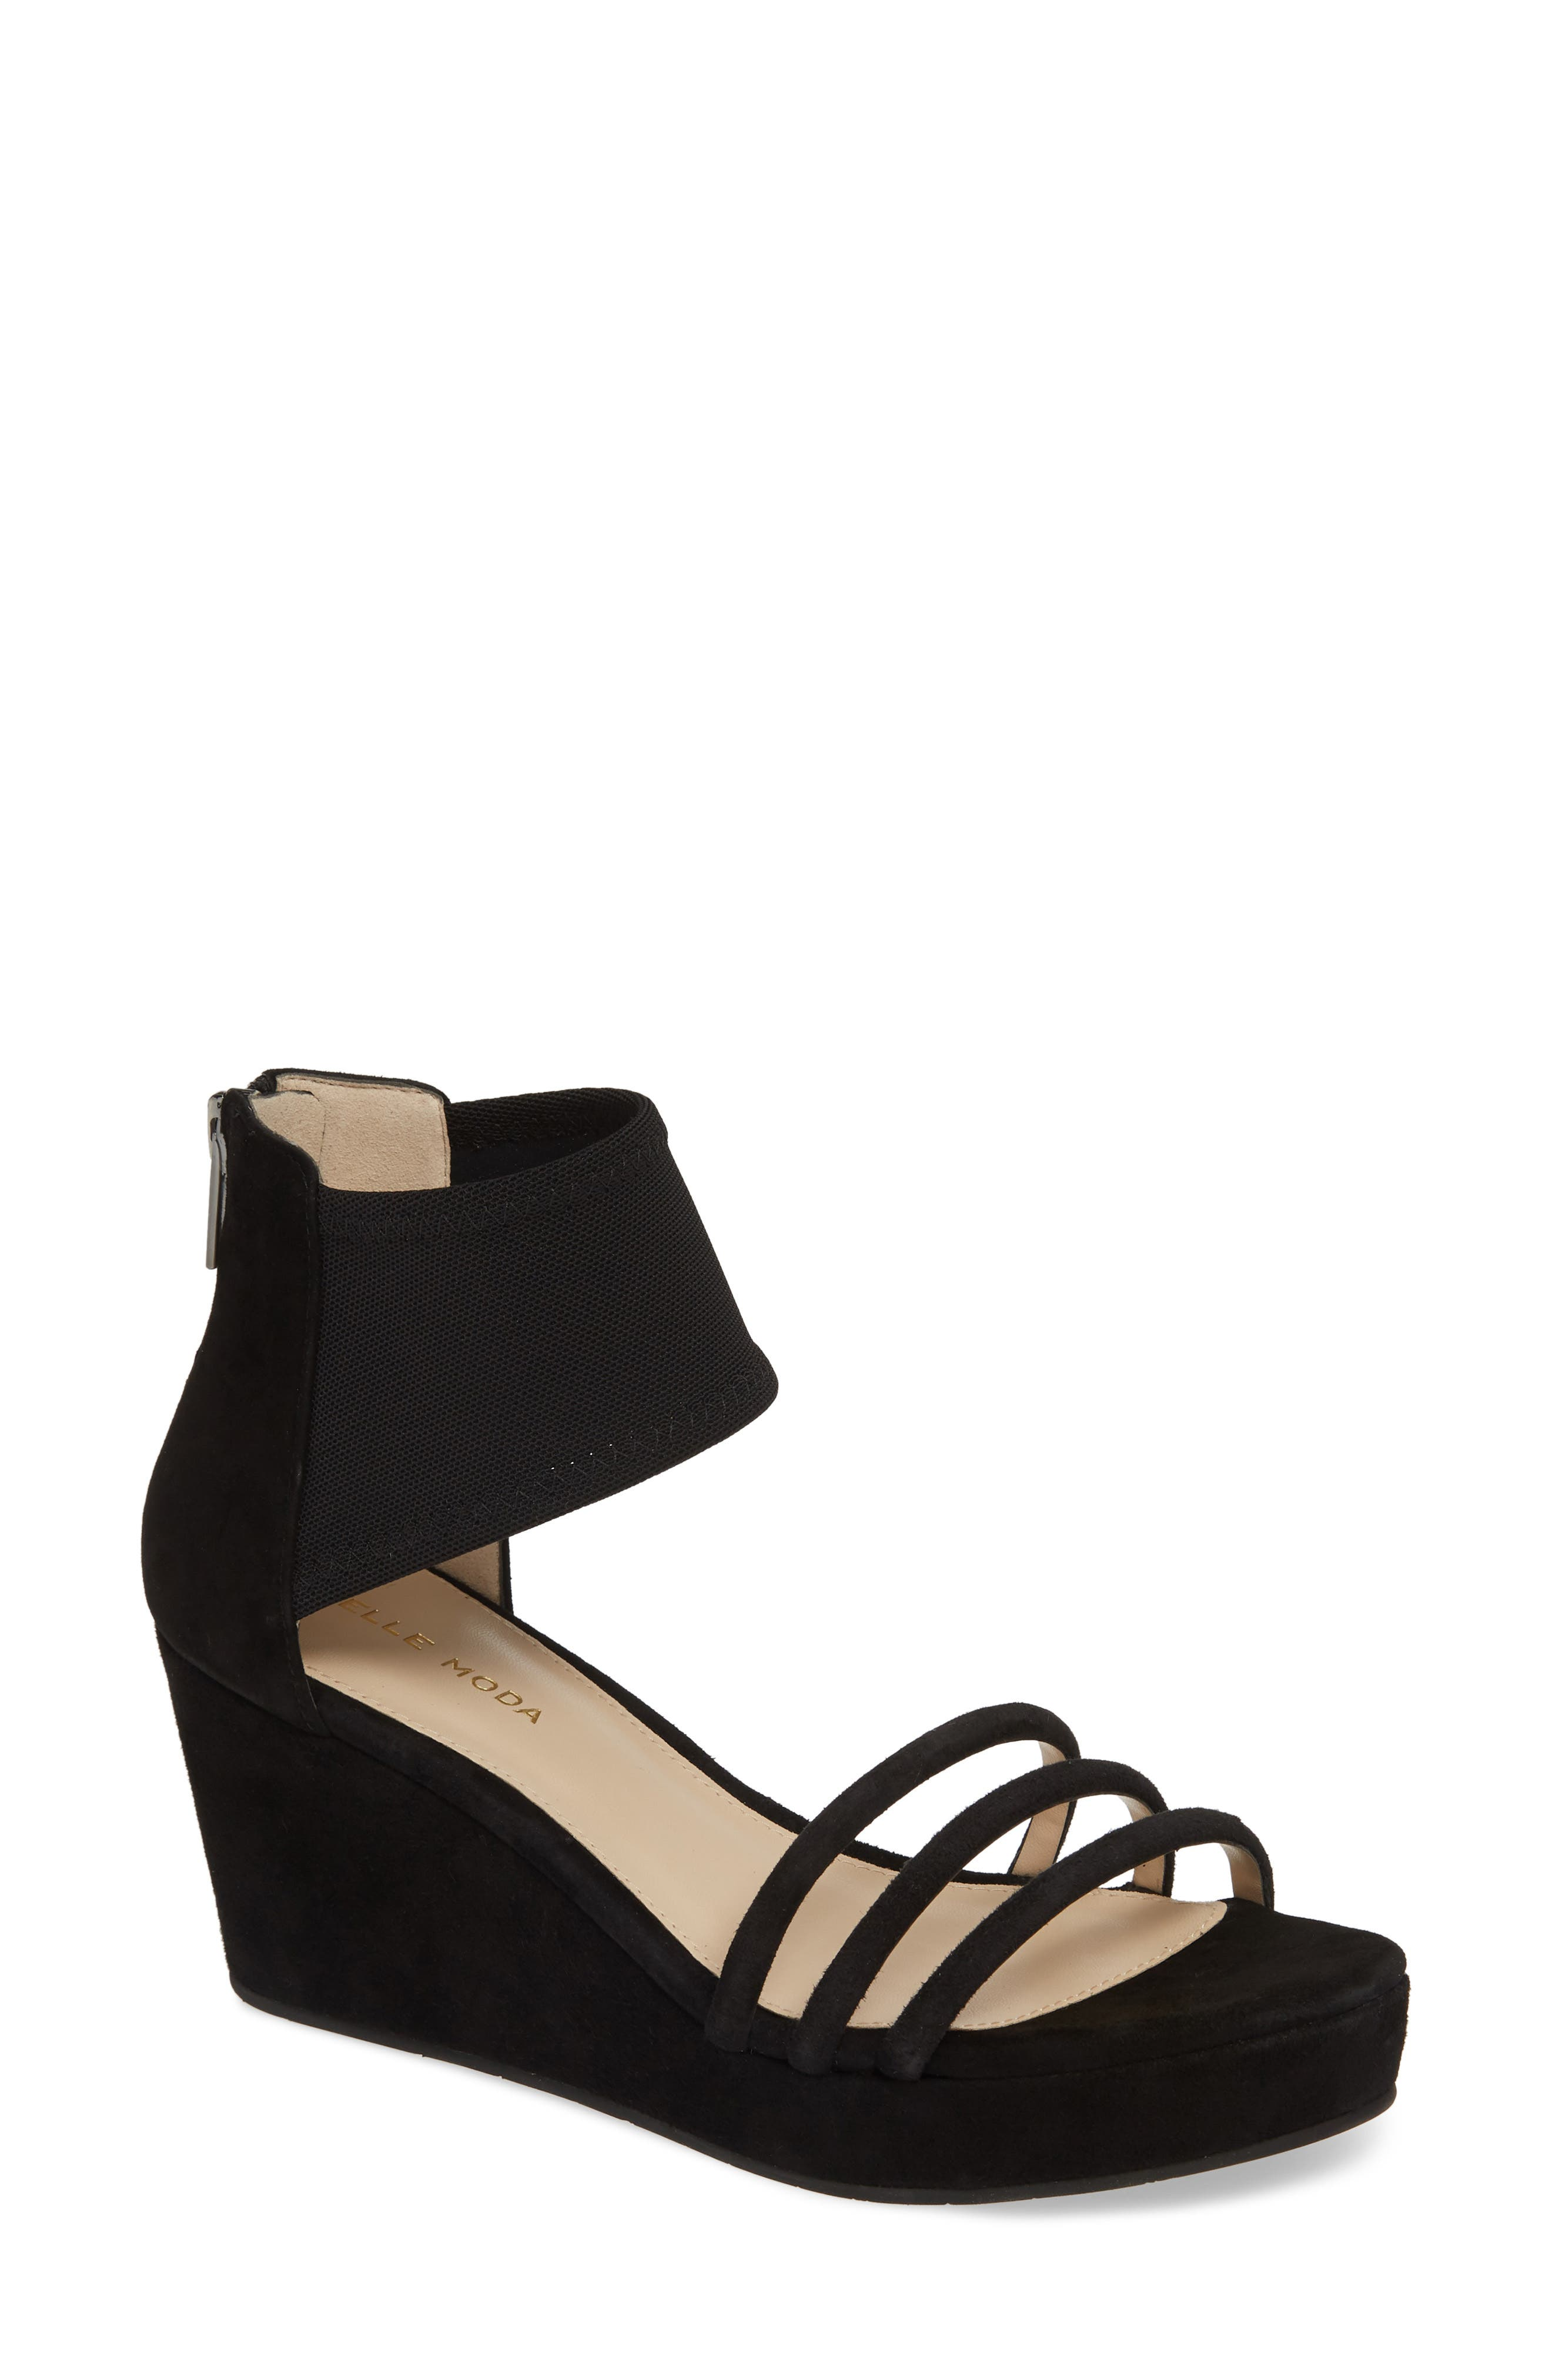 PELLE MODA, Katrice Platform Wedge Sandal, Main thumbnail 1, color, BLACK SUEDE